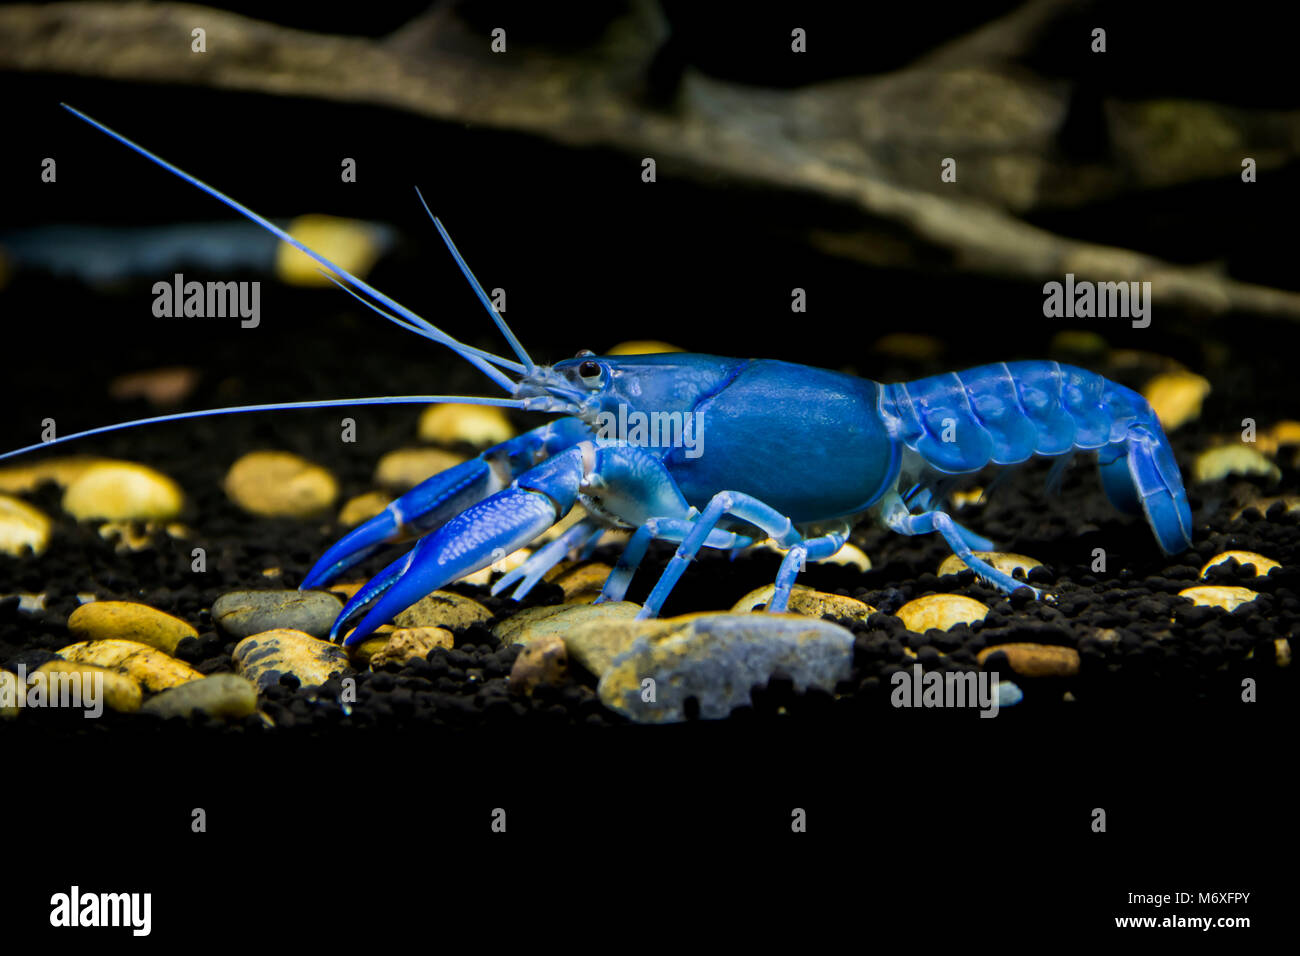 Crayfish Cherax destructor - Stock Image